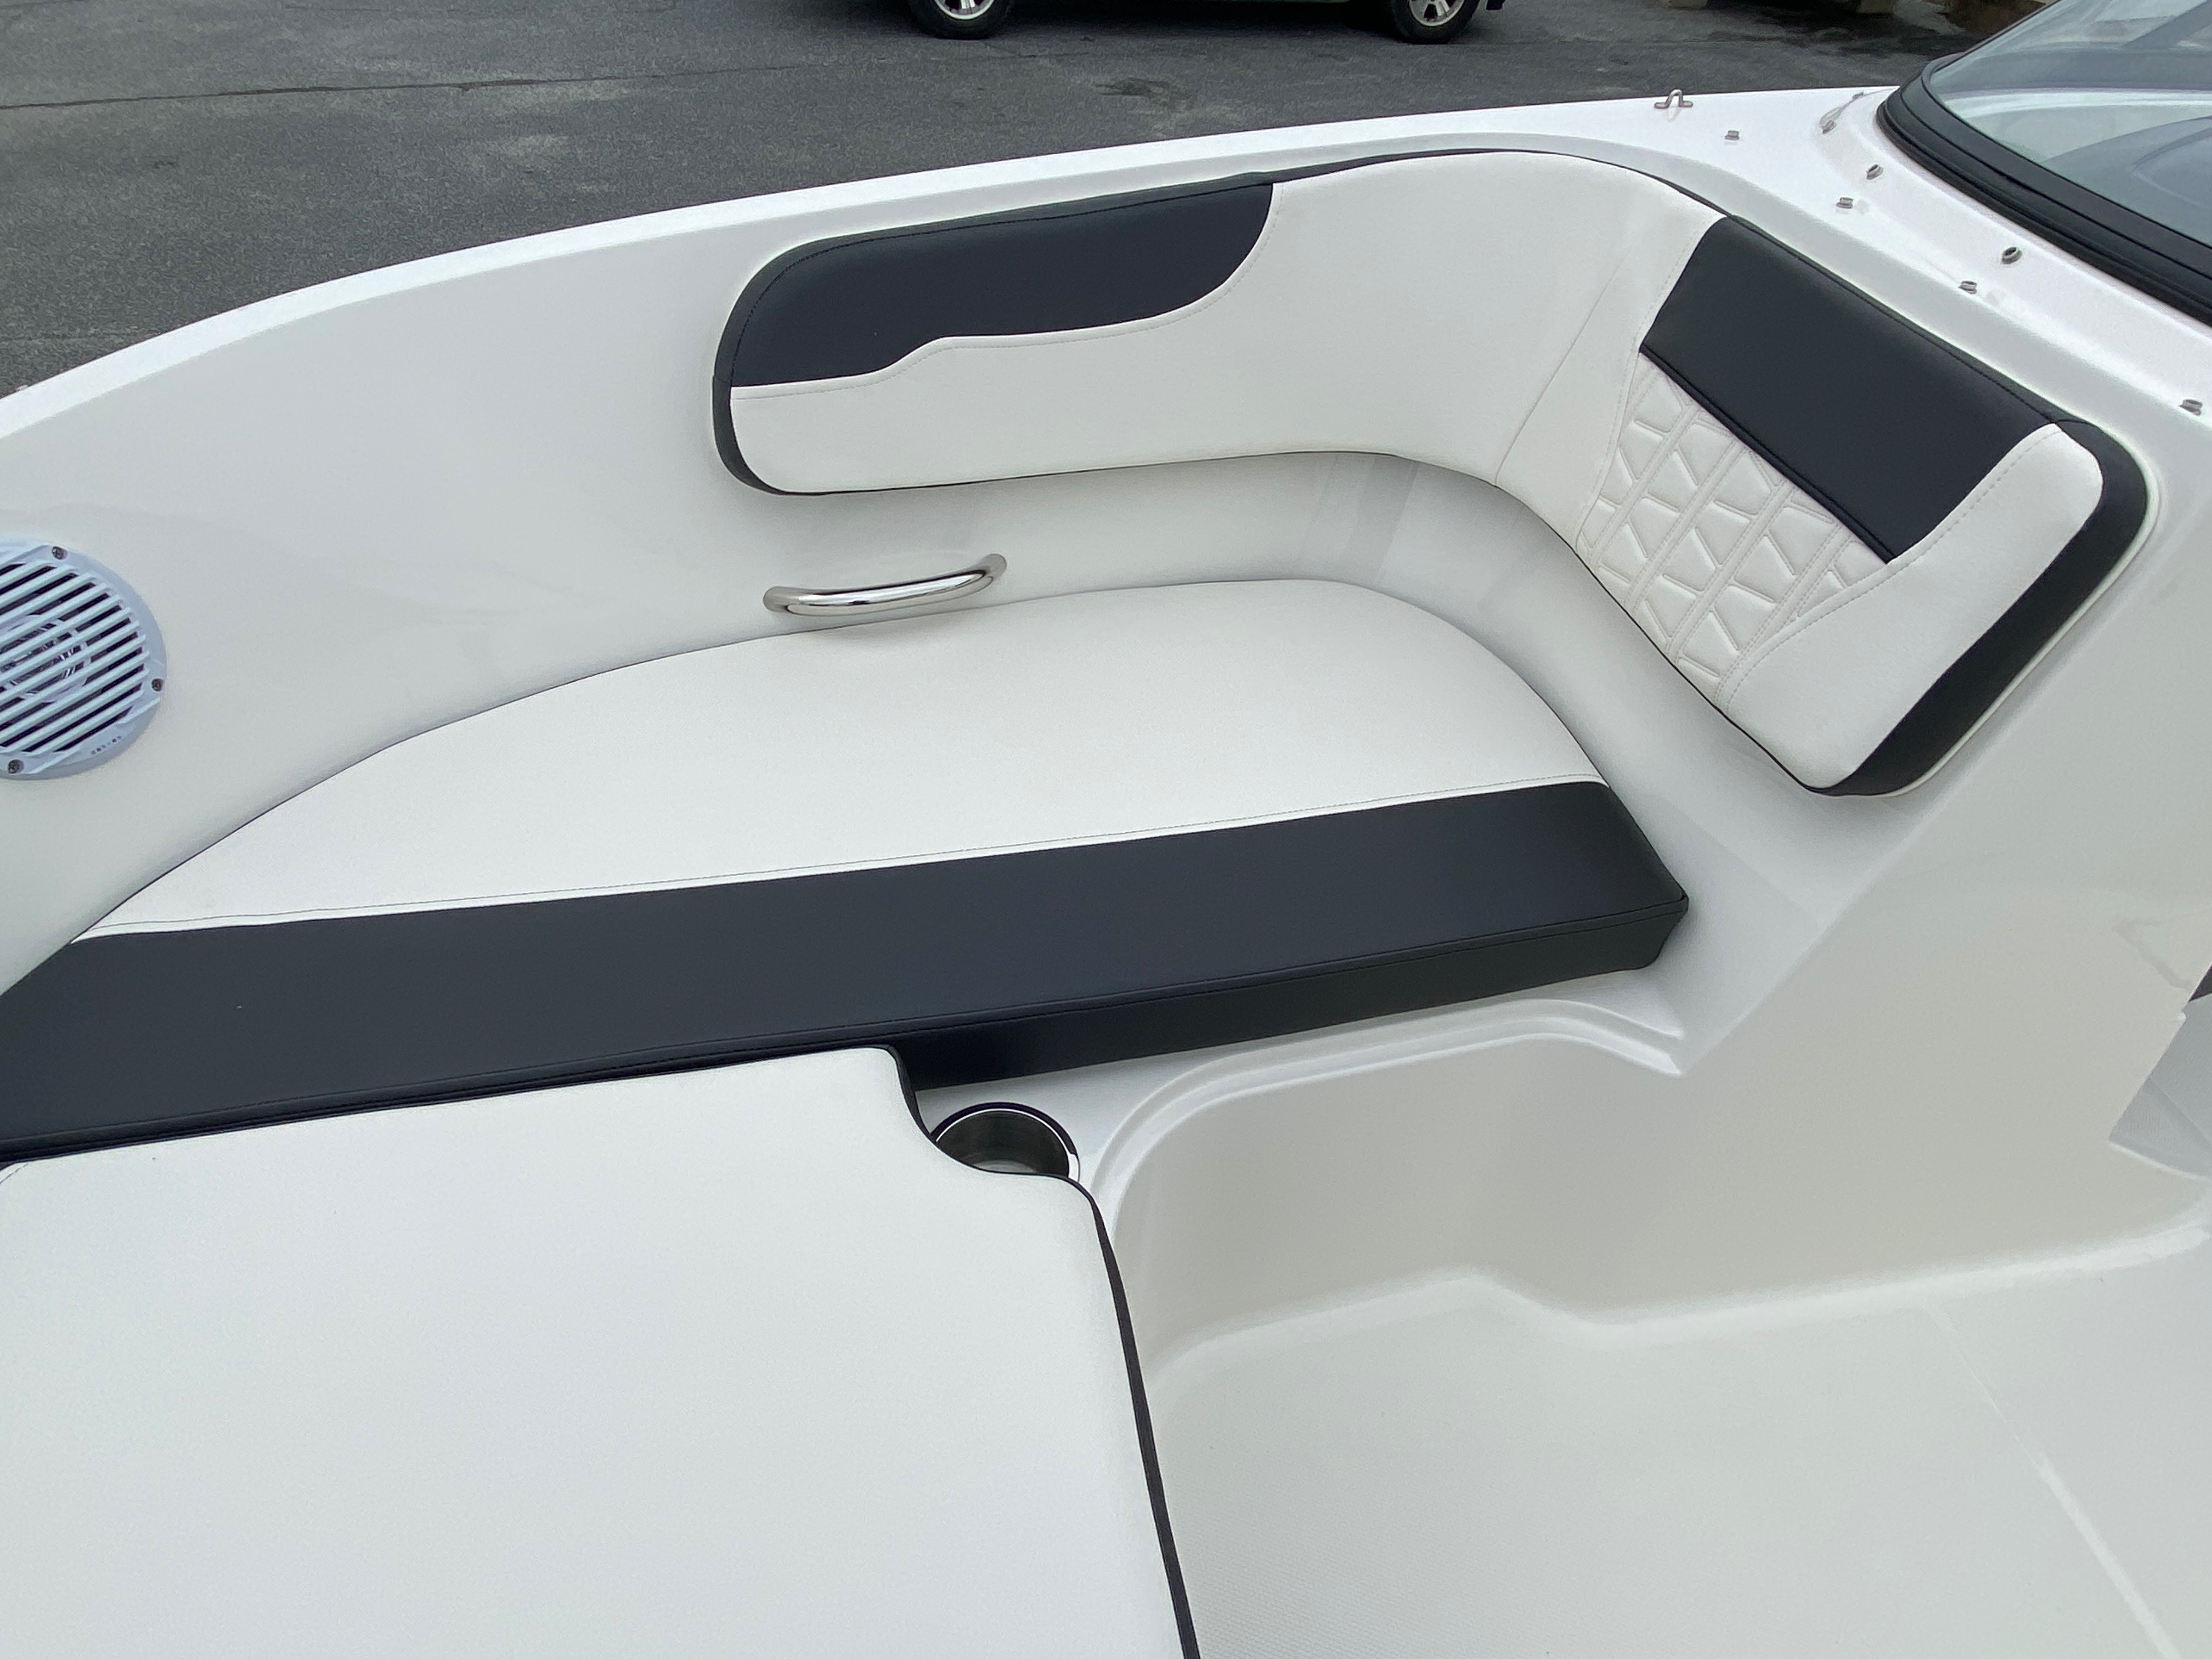 2020 Bayliner boat for sale, model of the boat is VR6 Bowrider & Image # 5 of 14